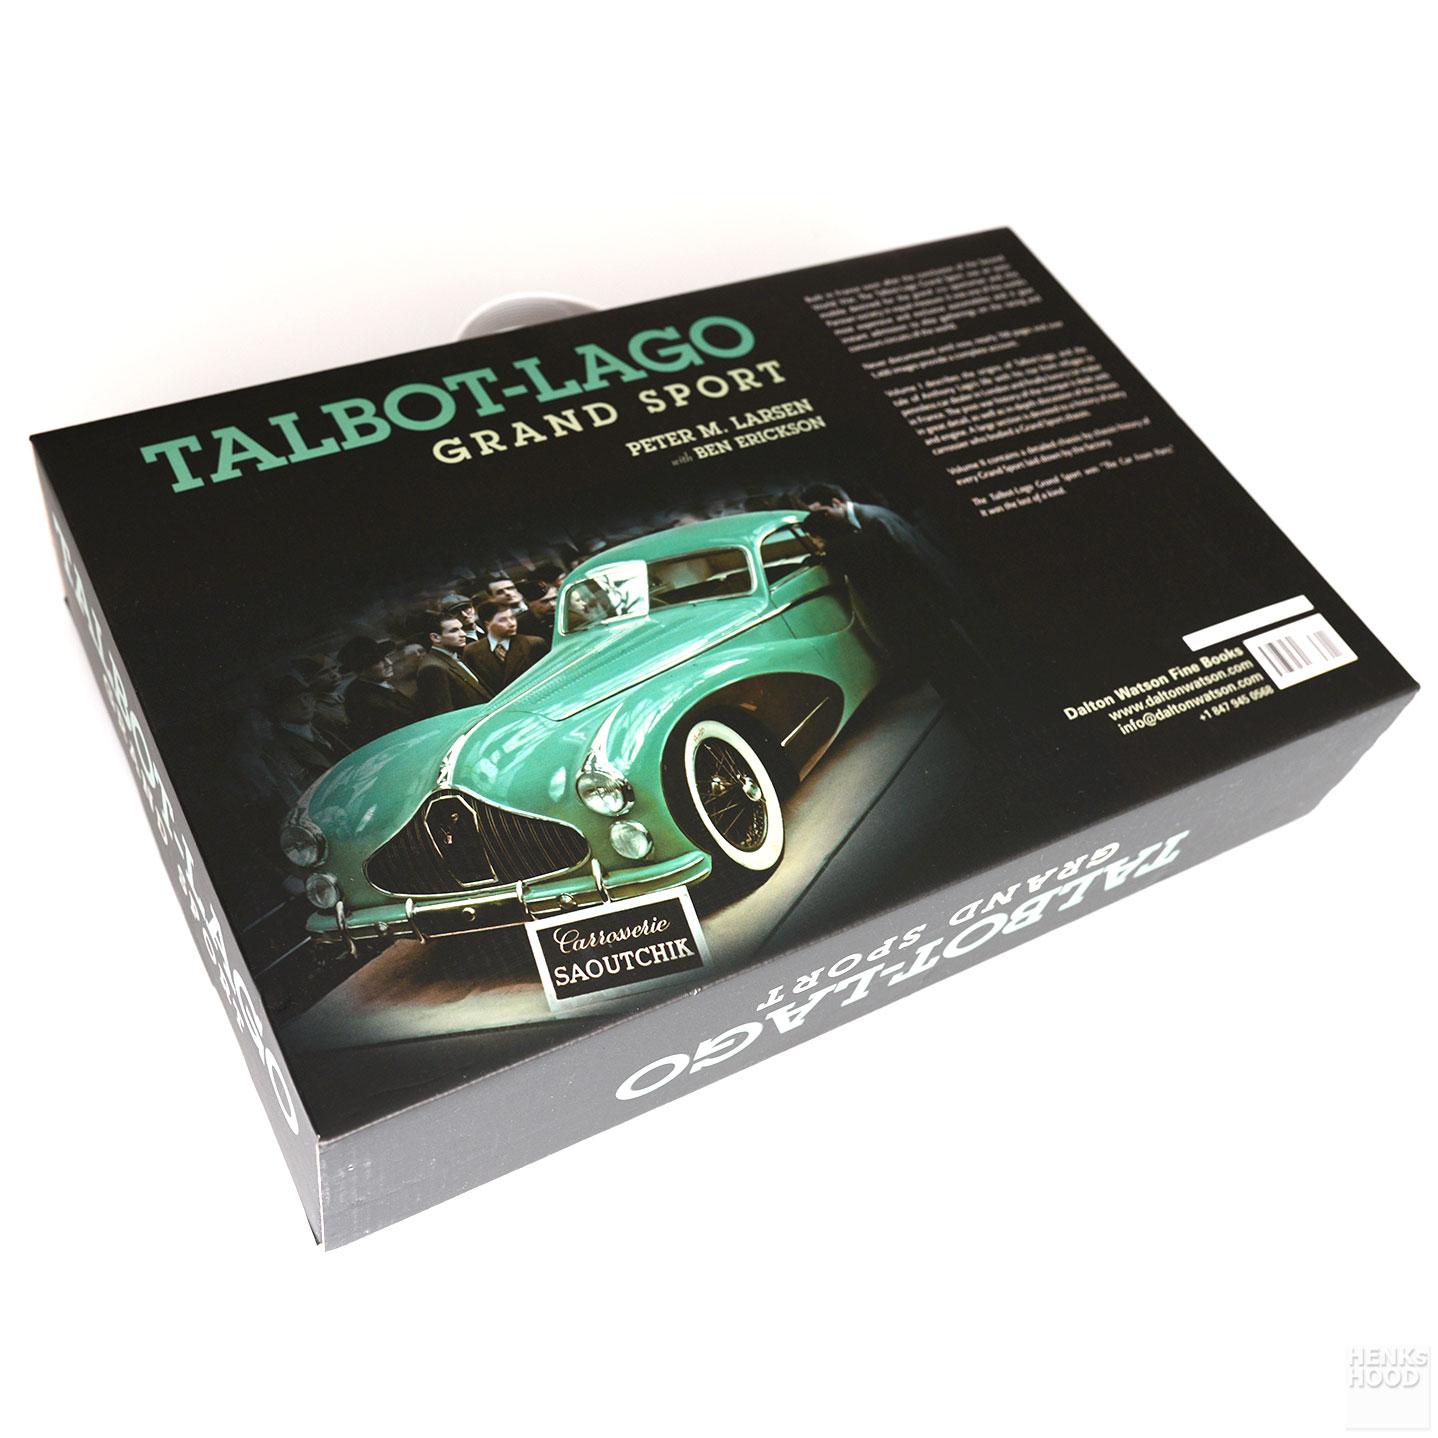 Peter M. Larsen: Talbot-Lago Grand Sport